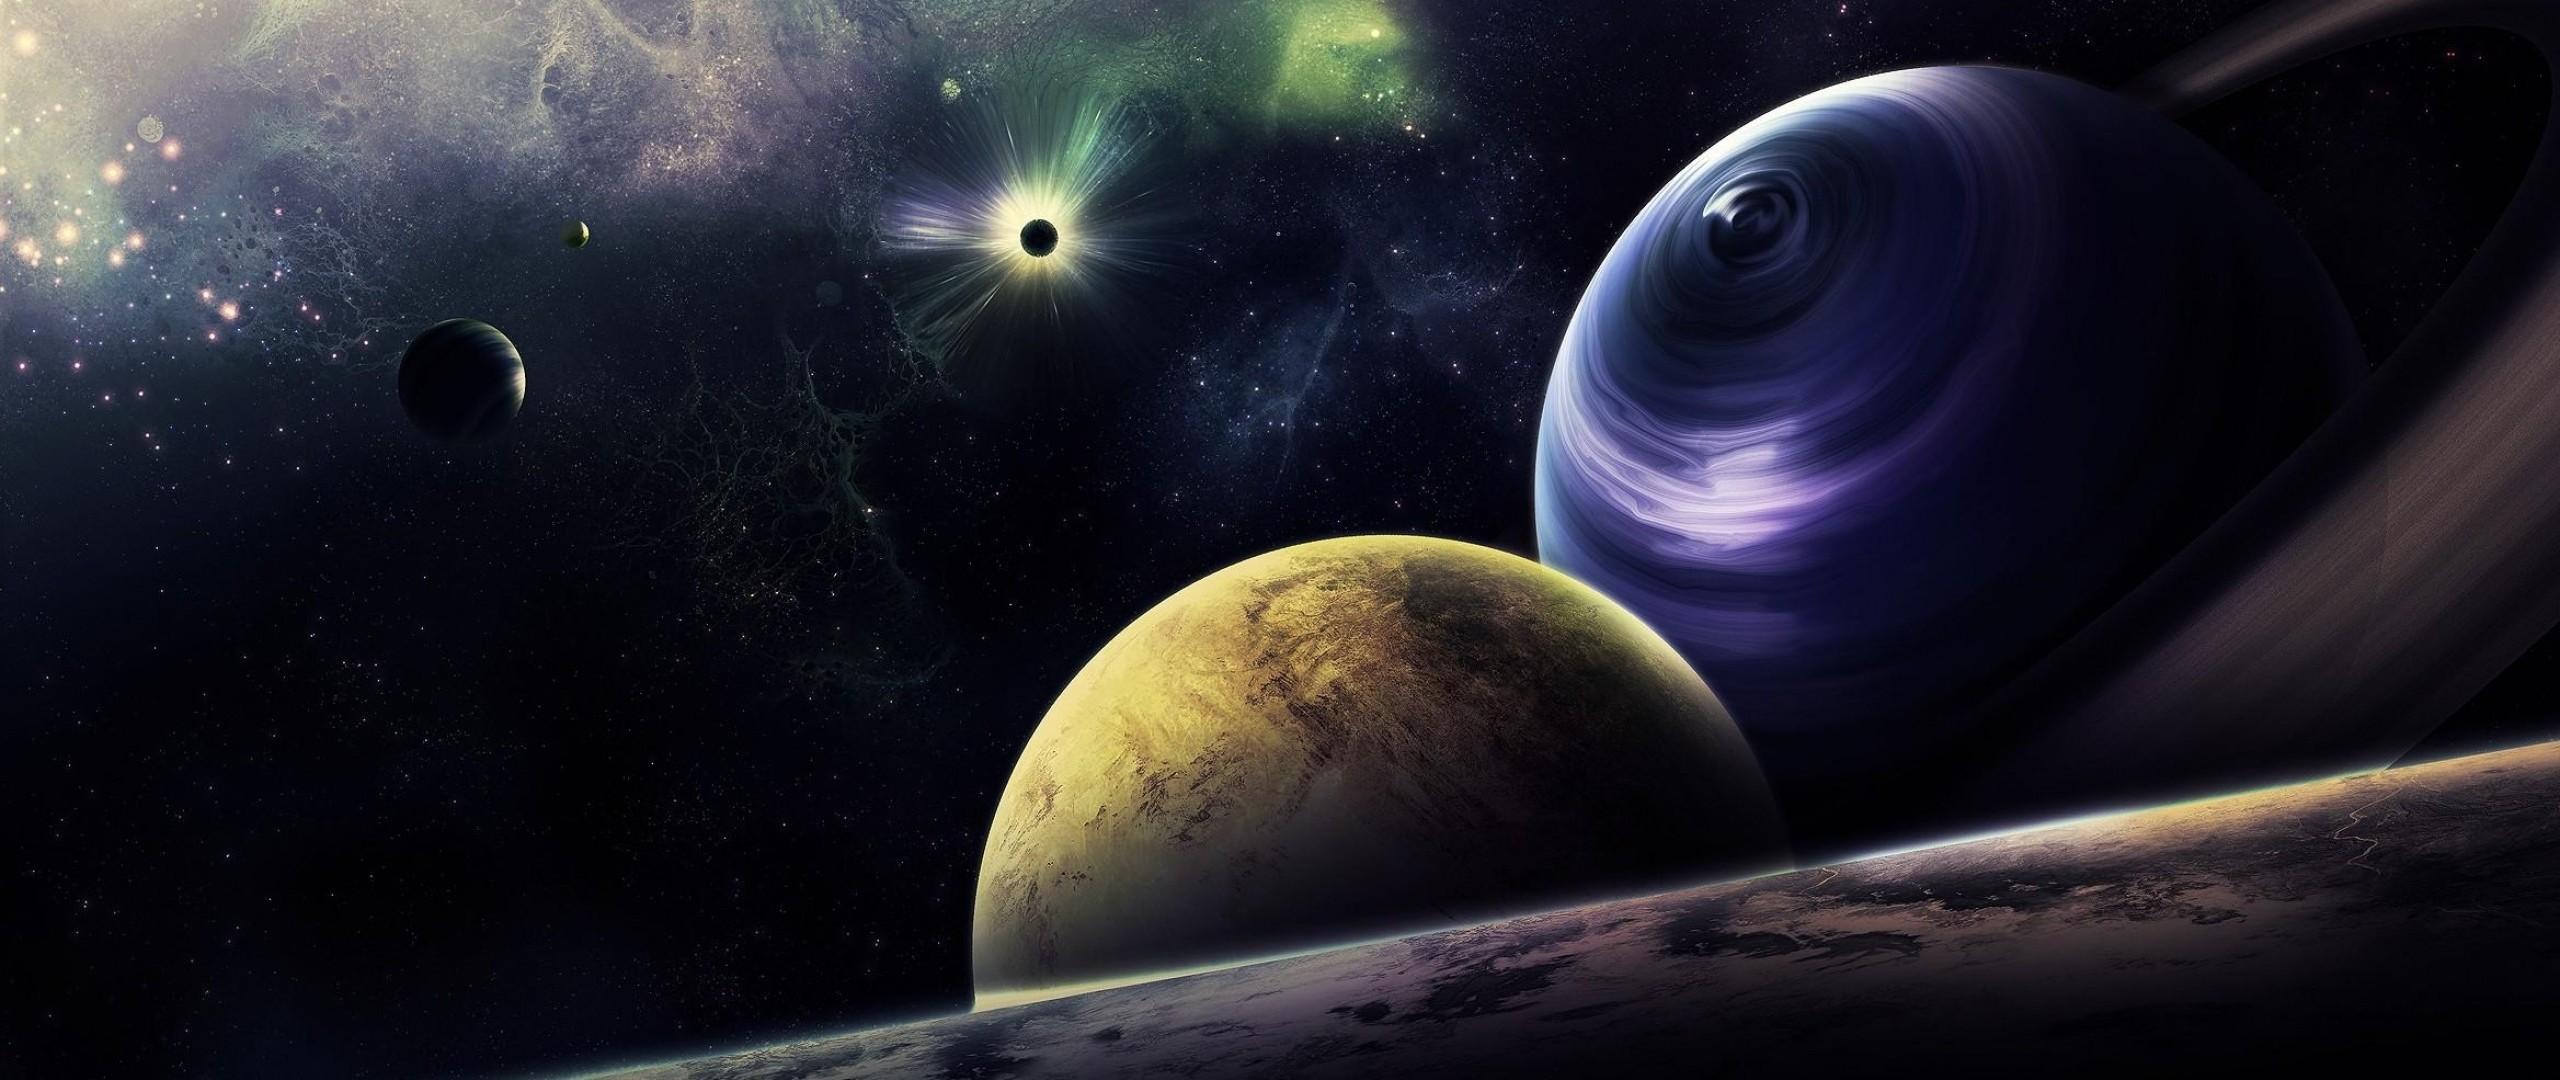 Wallpaper planets, circle, flash, radiance, galaxy